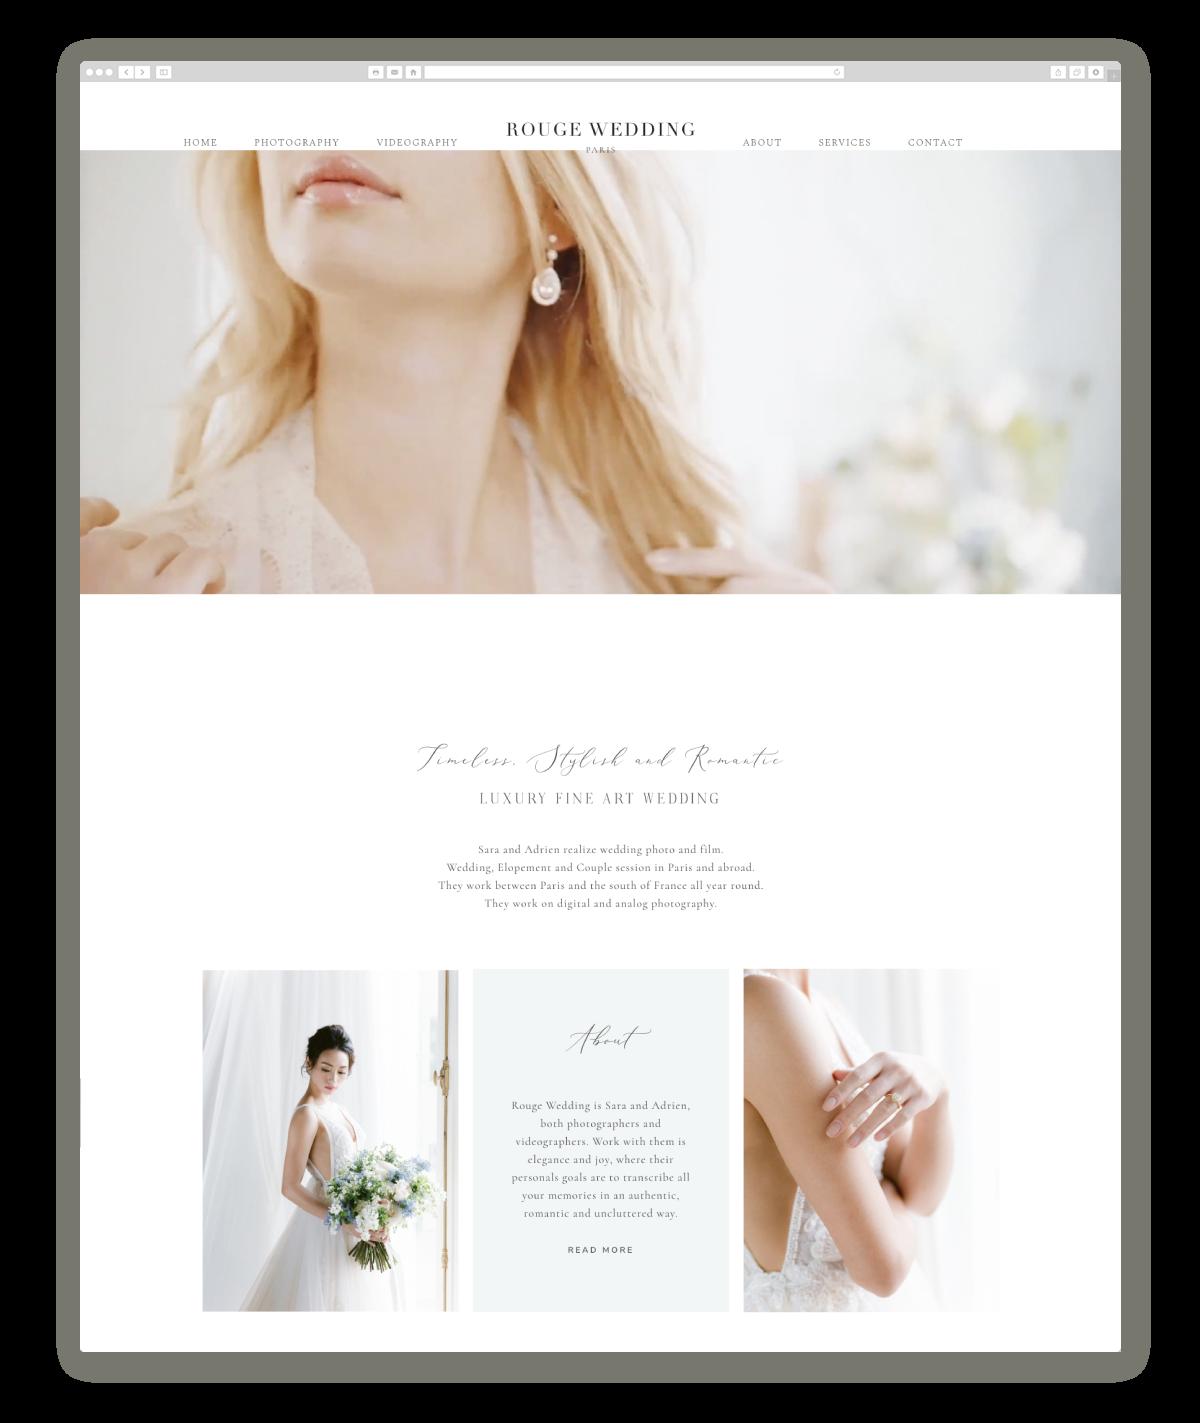 wedding photography website design rougewedding.com